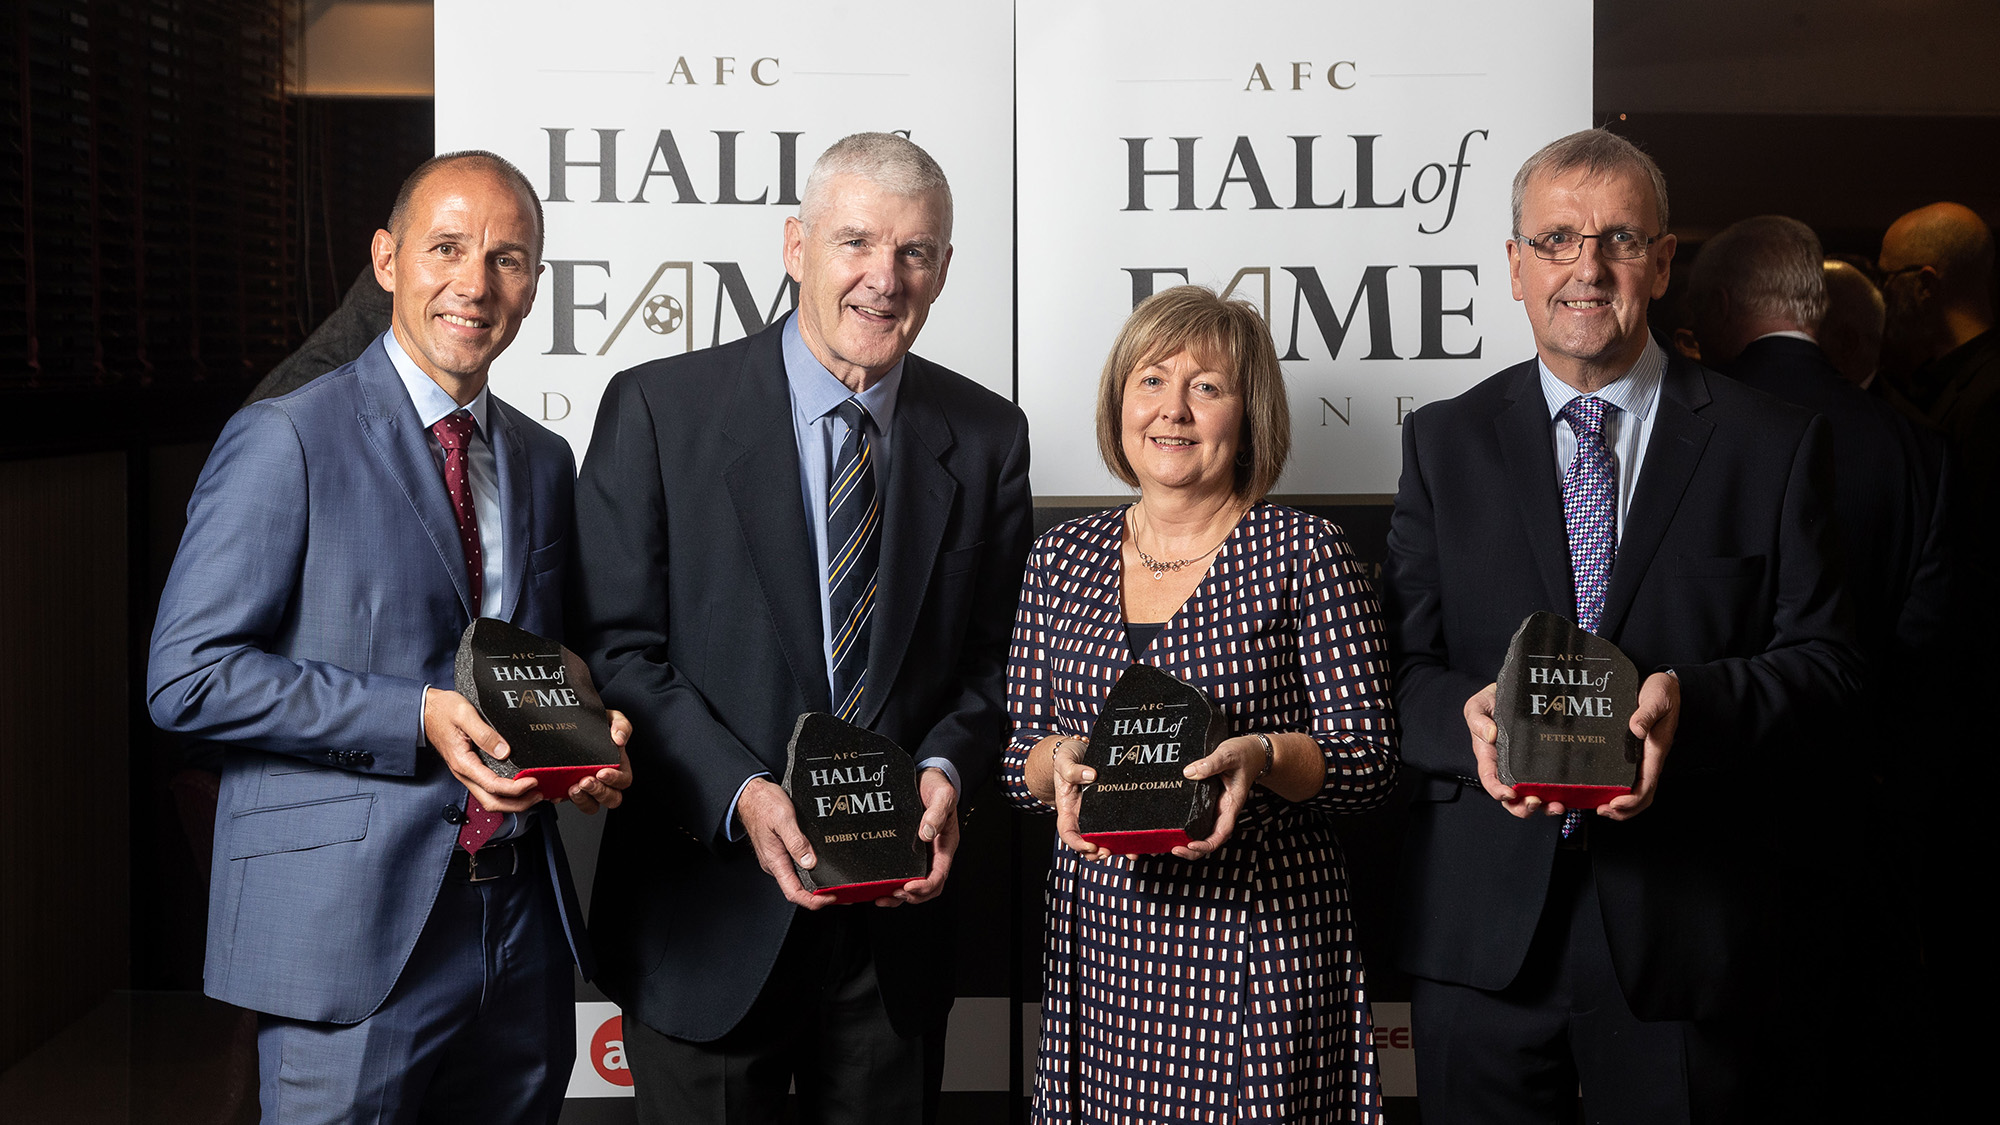 AFC HALL OF FAME 2018